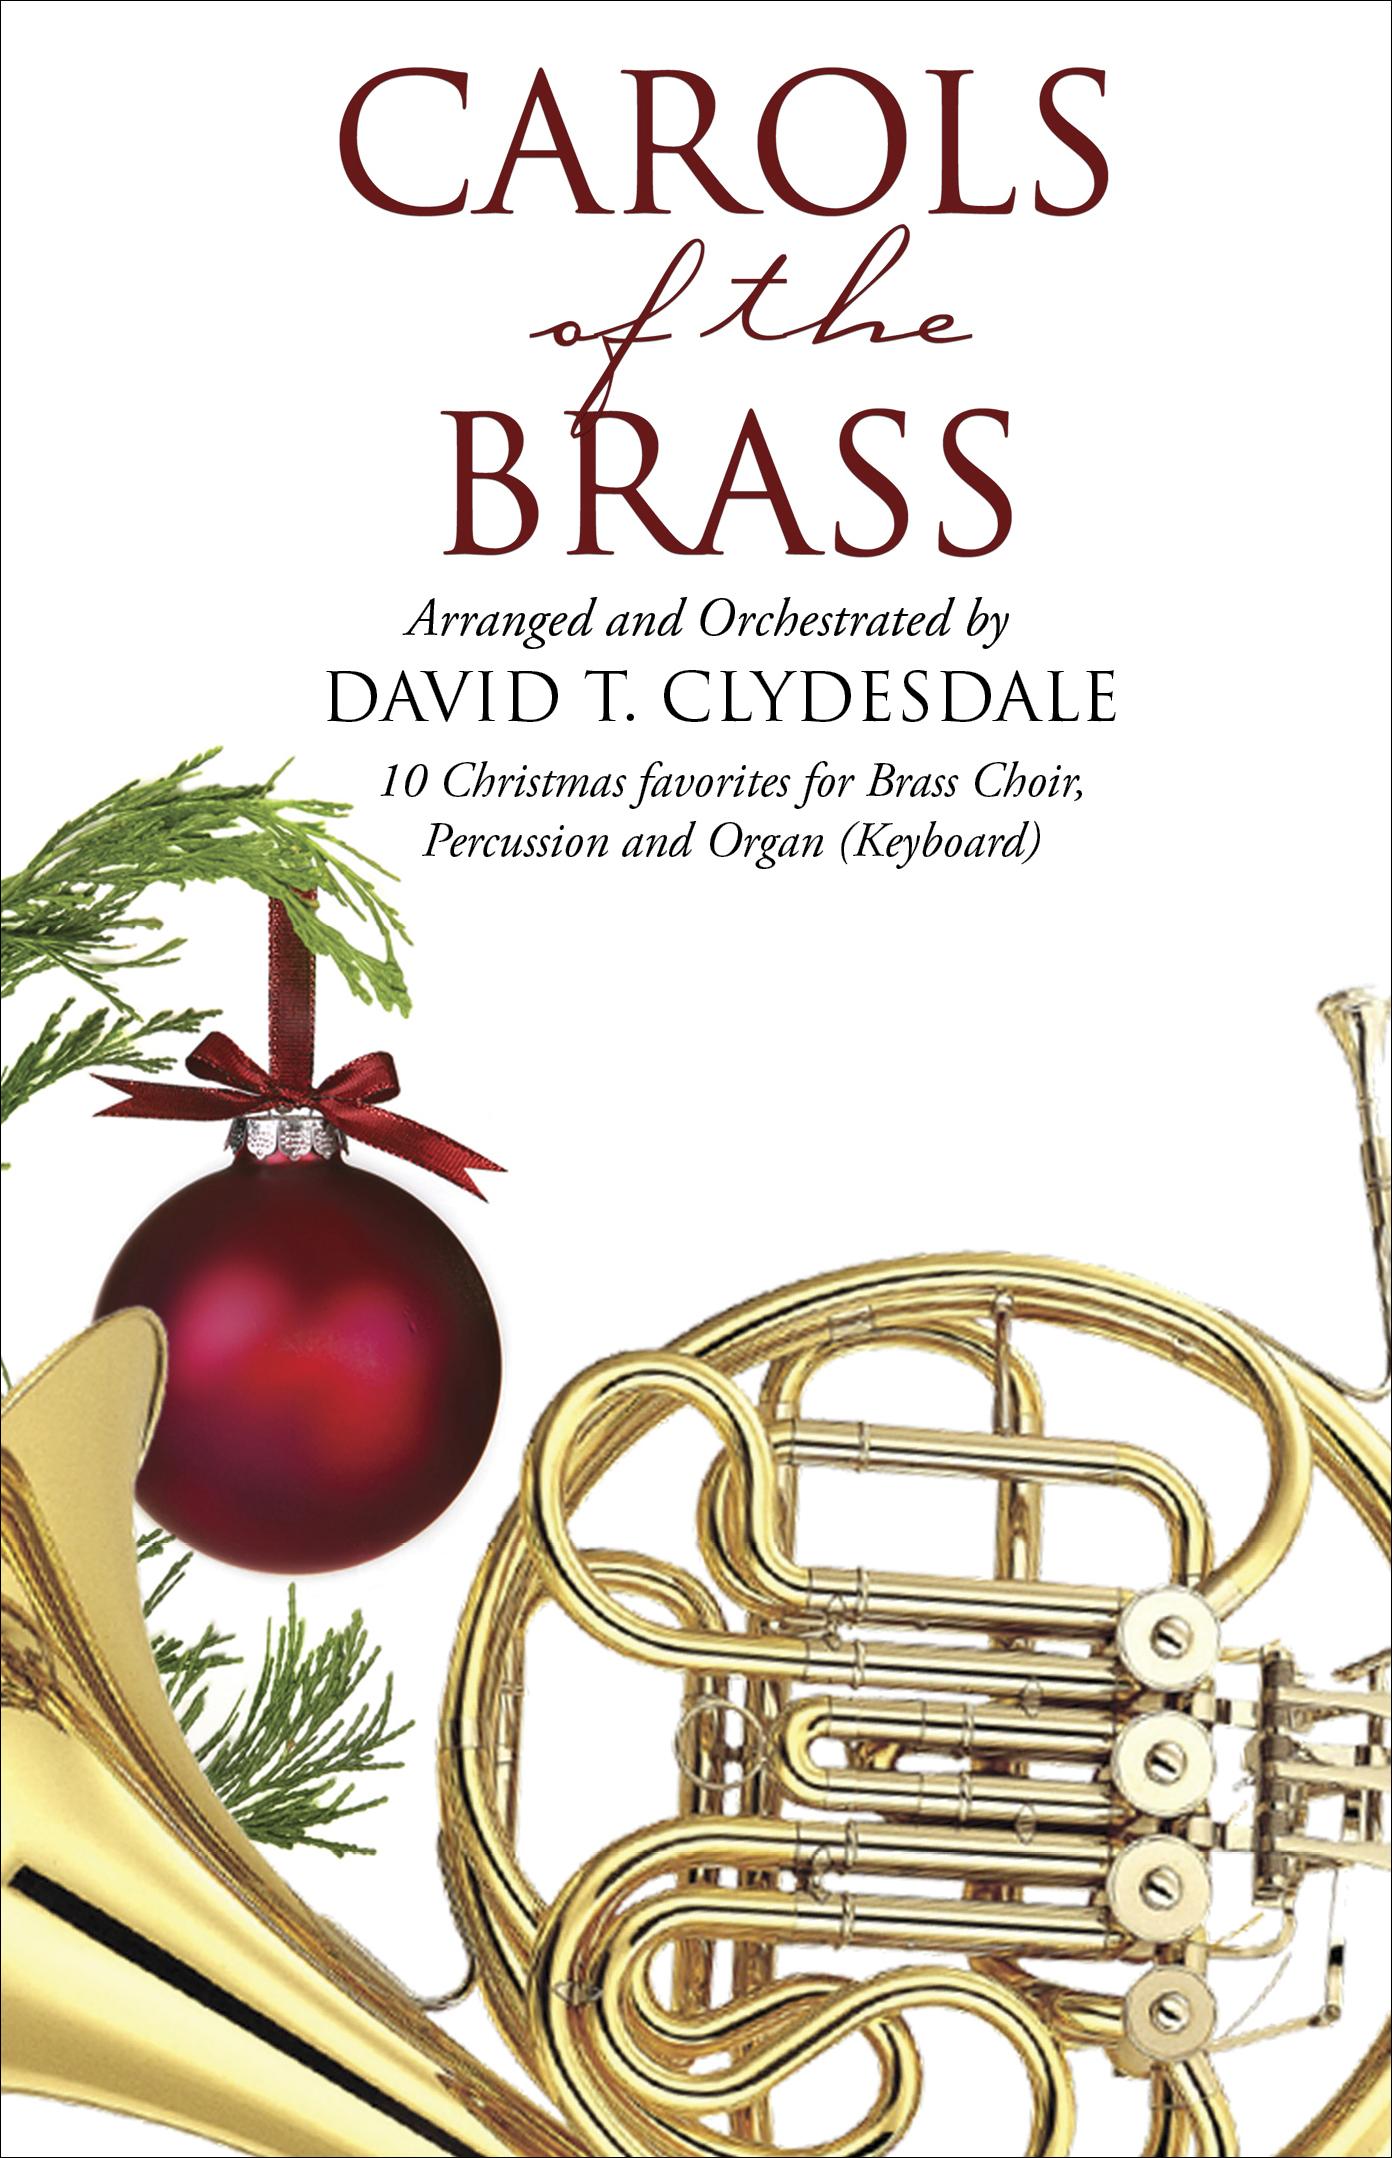 Carols of the Brass